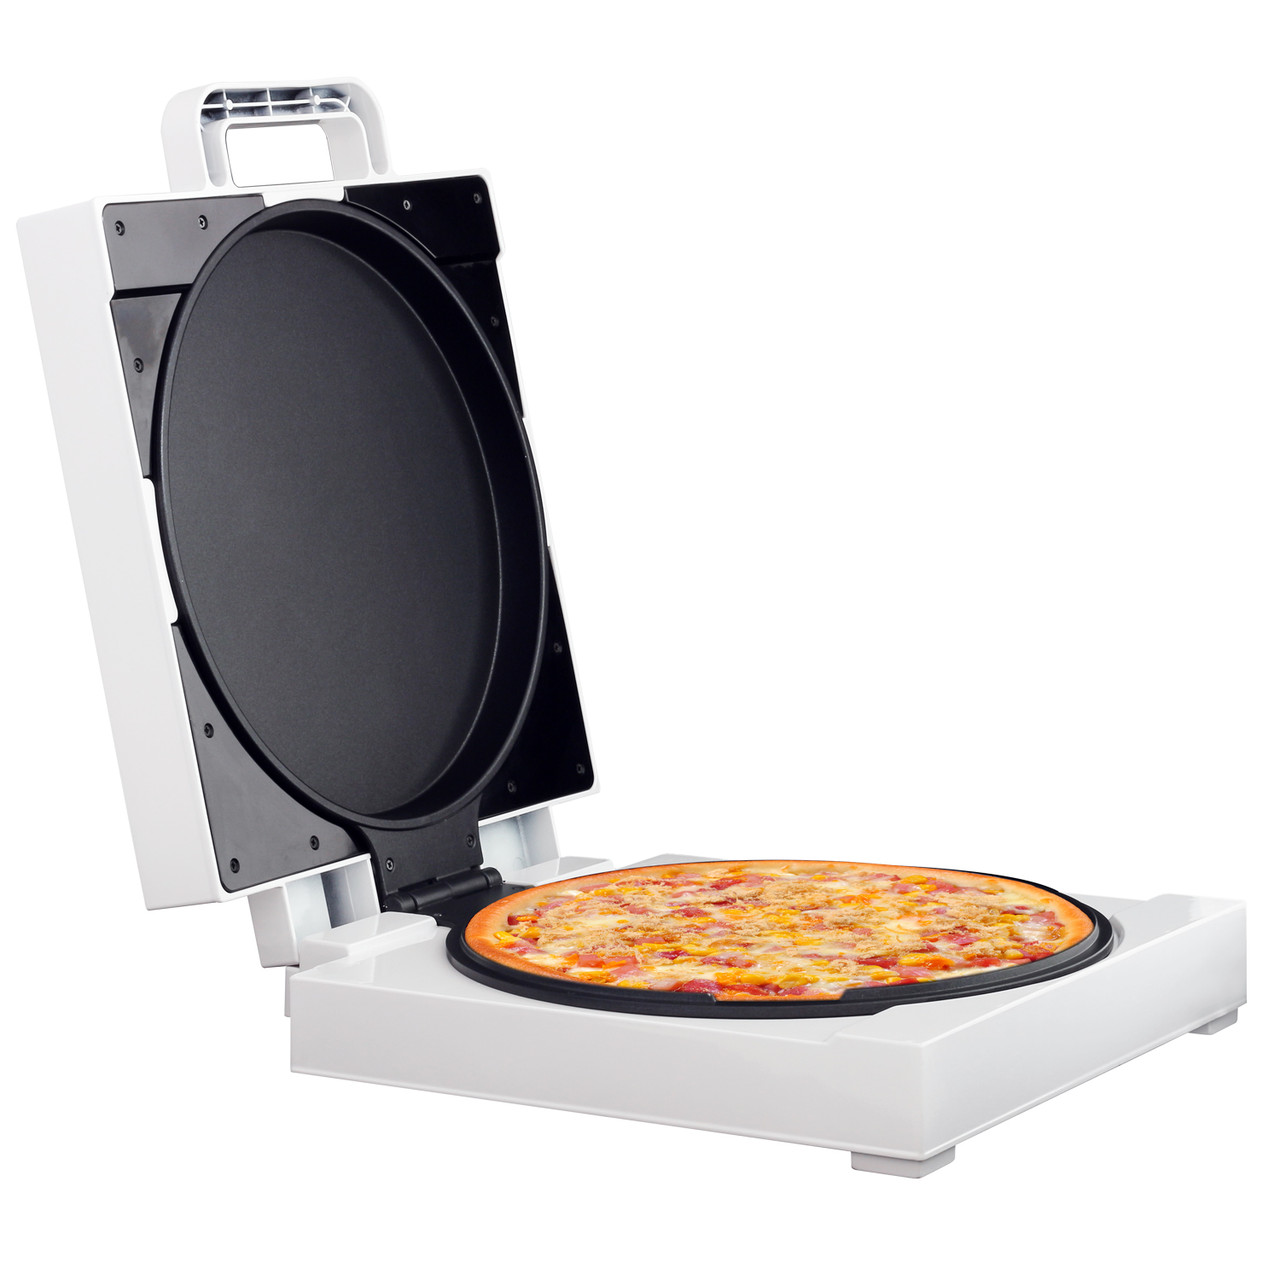 Приготовитель пиццы Pizza Maker Royalty Line PZB-1200.149.1